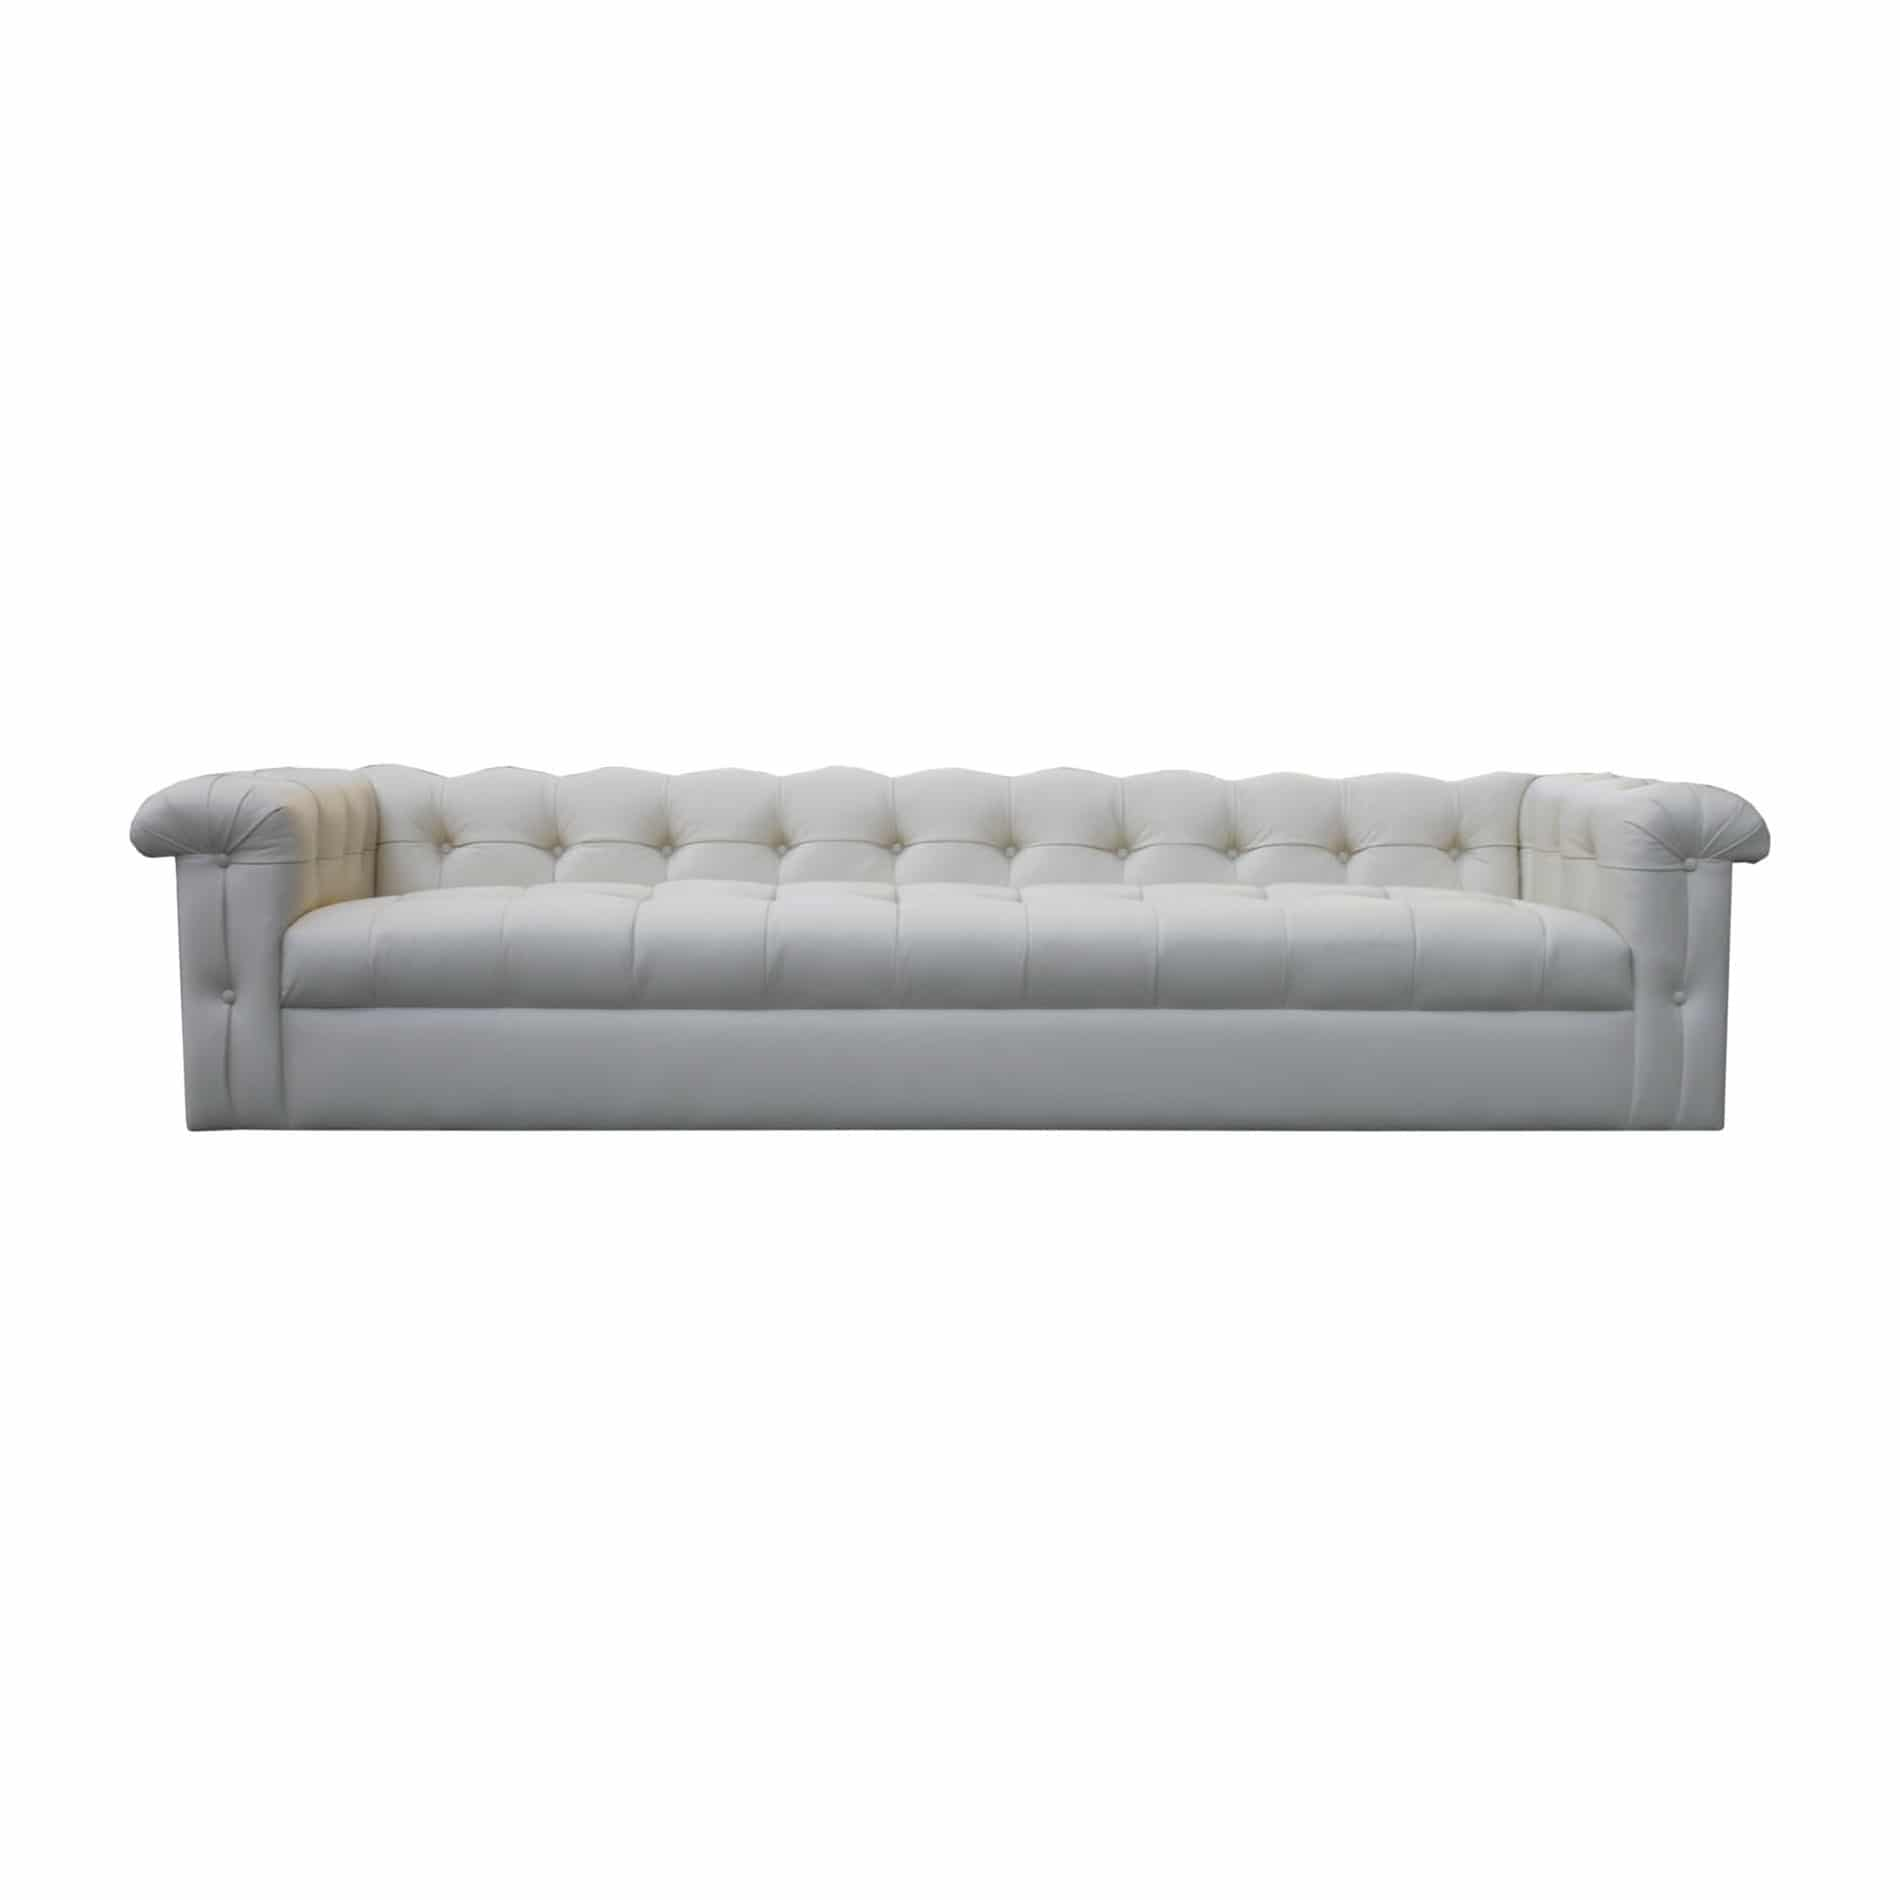 12 foot sofa lazy boy sleeper sale edward wormley for dunbar eight tufted leather